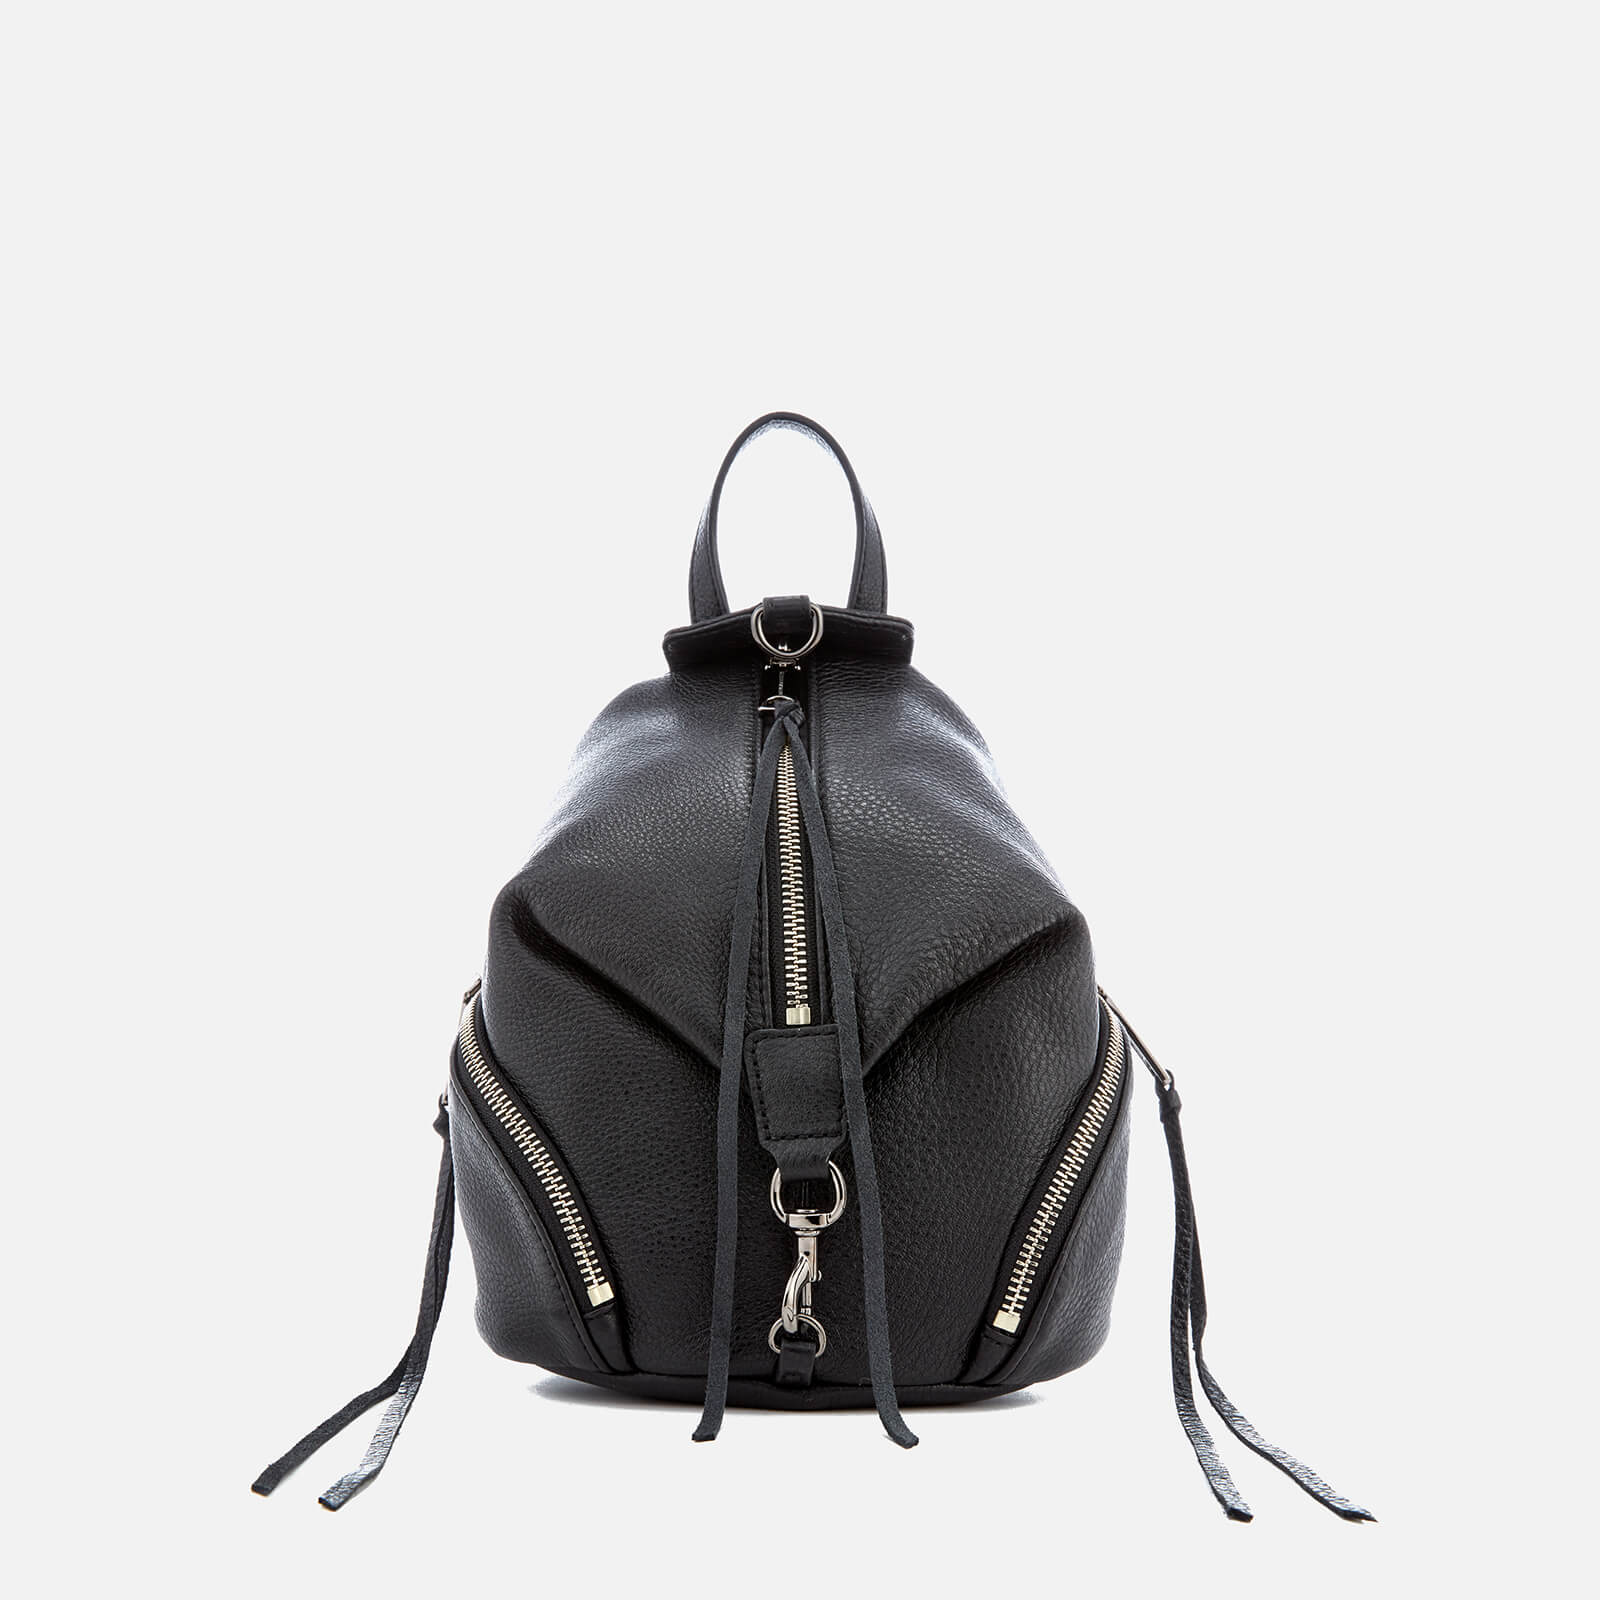 e335b1741563 Rebecca Minkoff Women s Convertible Mini Julian Backpack - Black ...